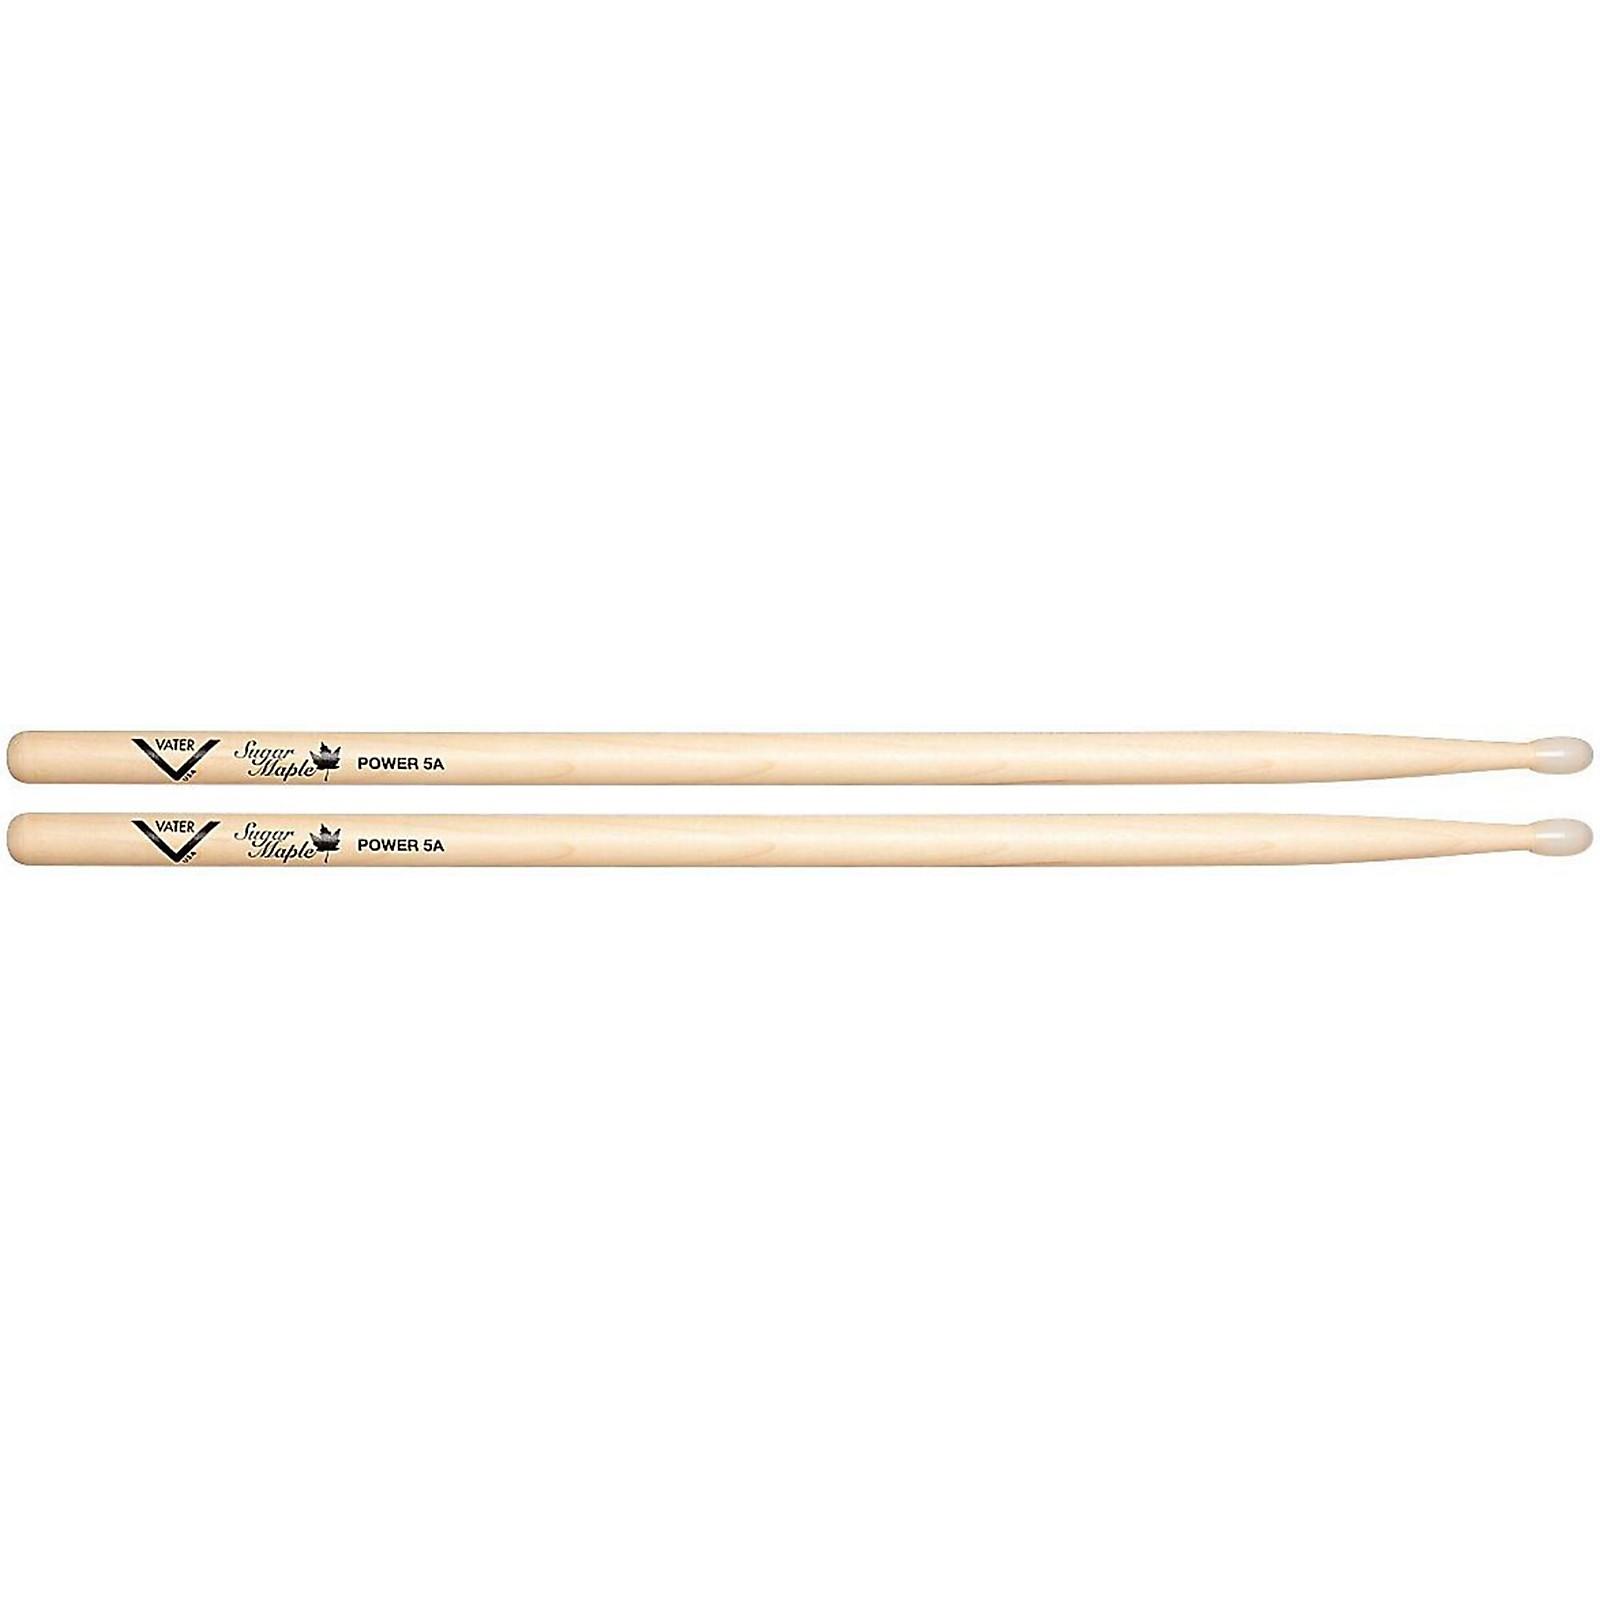 Vater Sugar Maple Drum Stick Power 5A